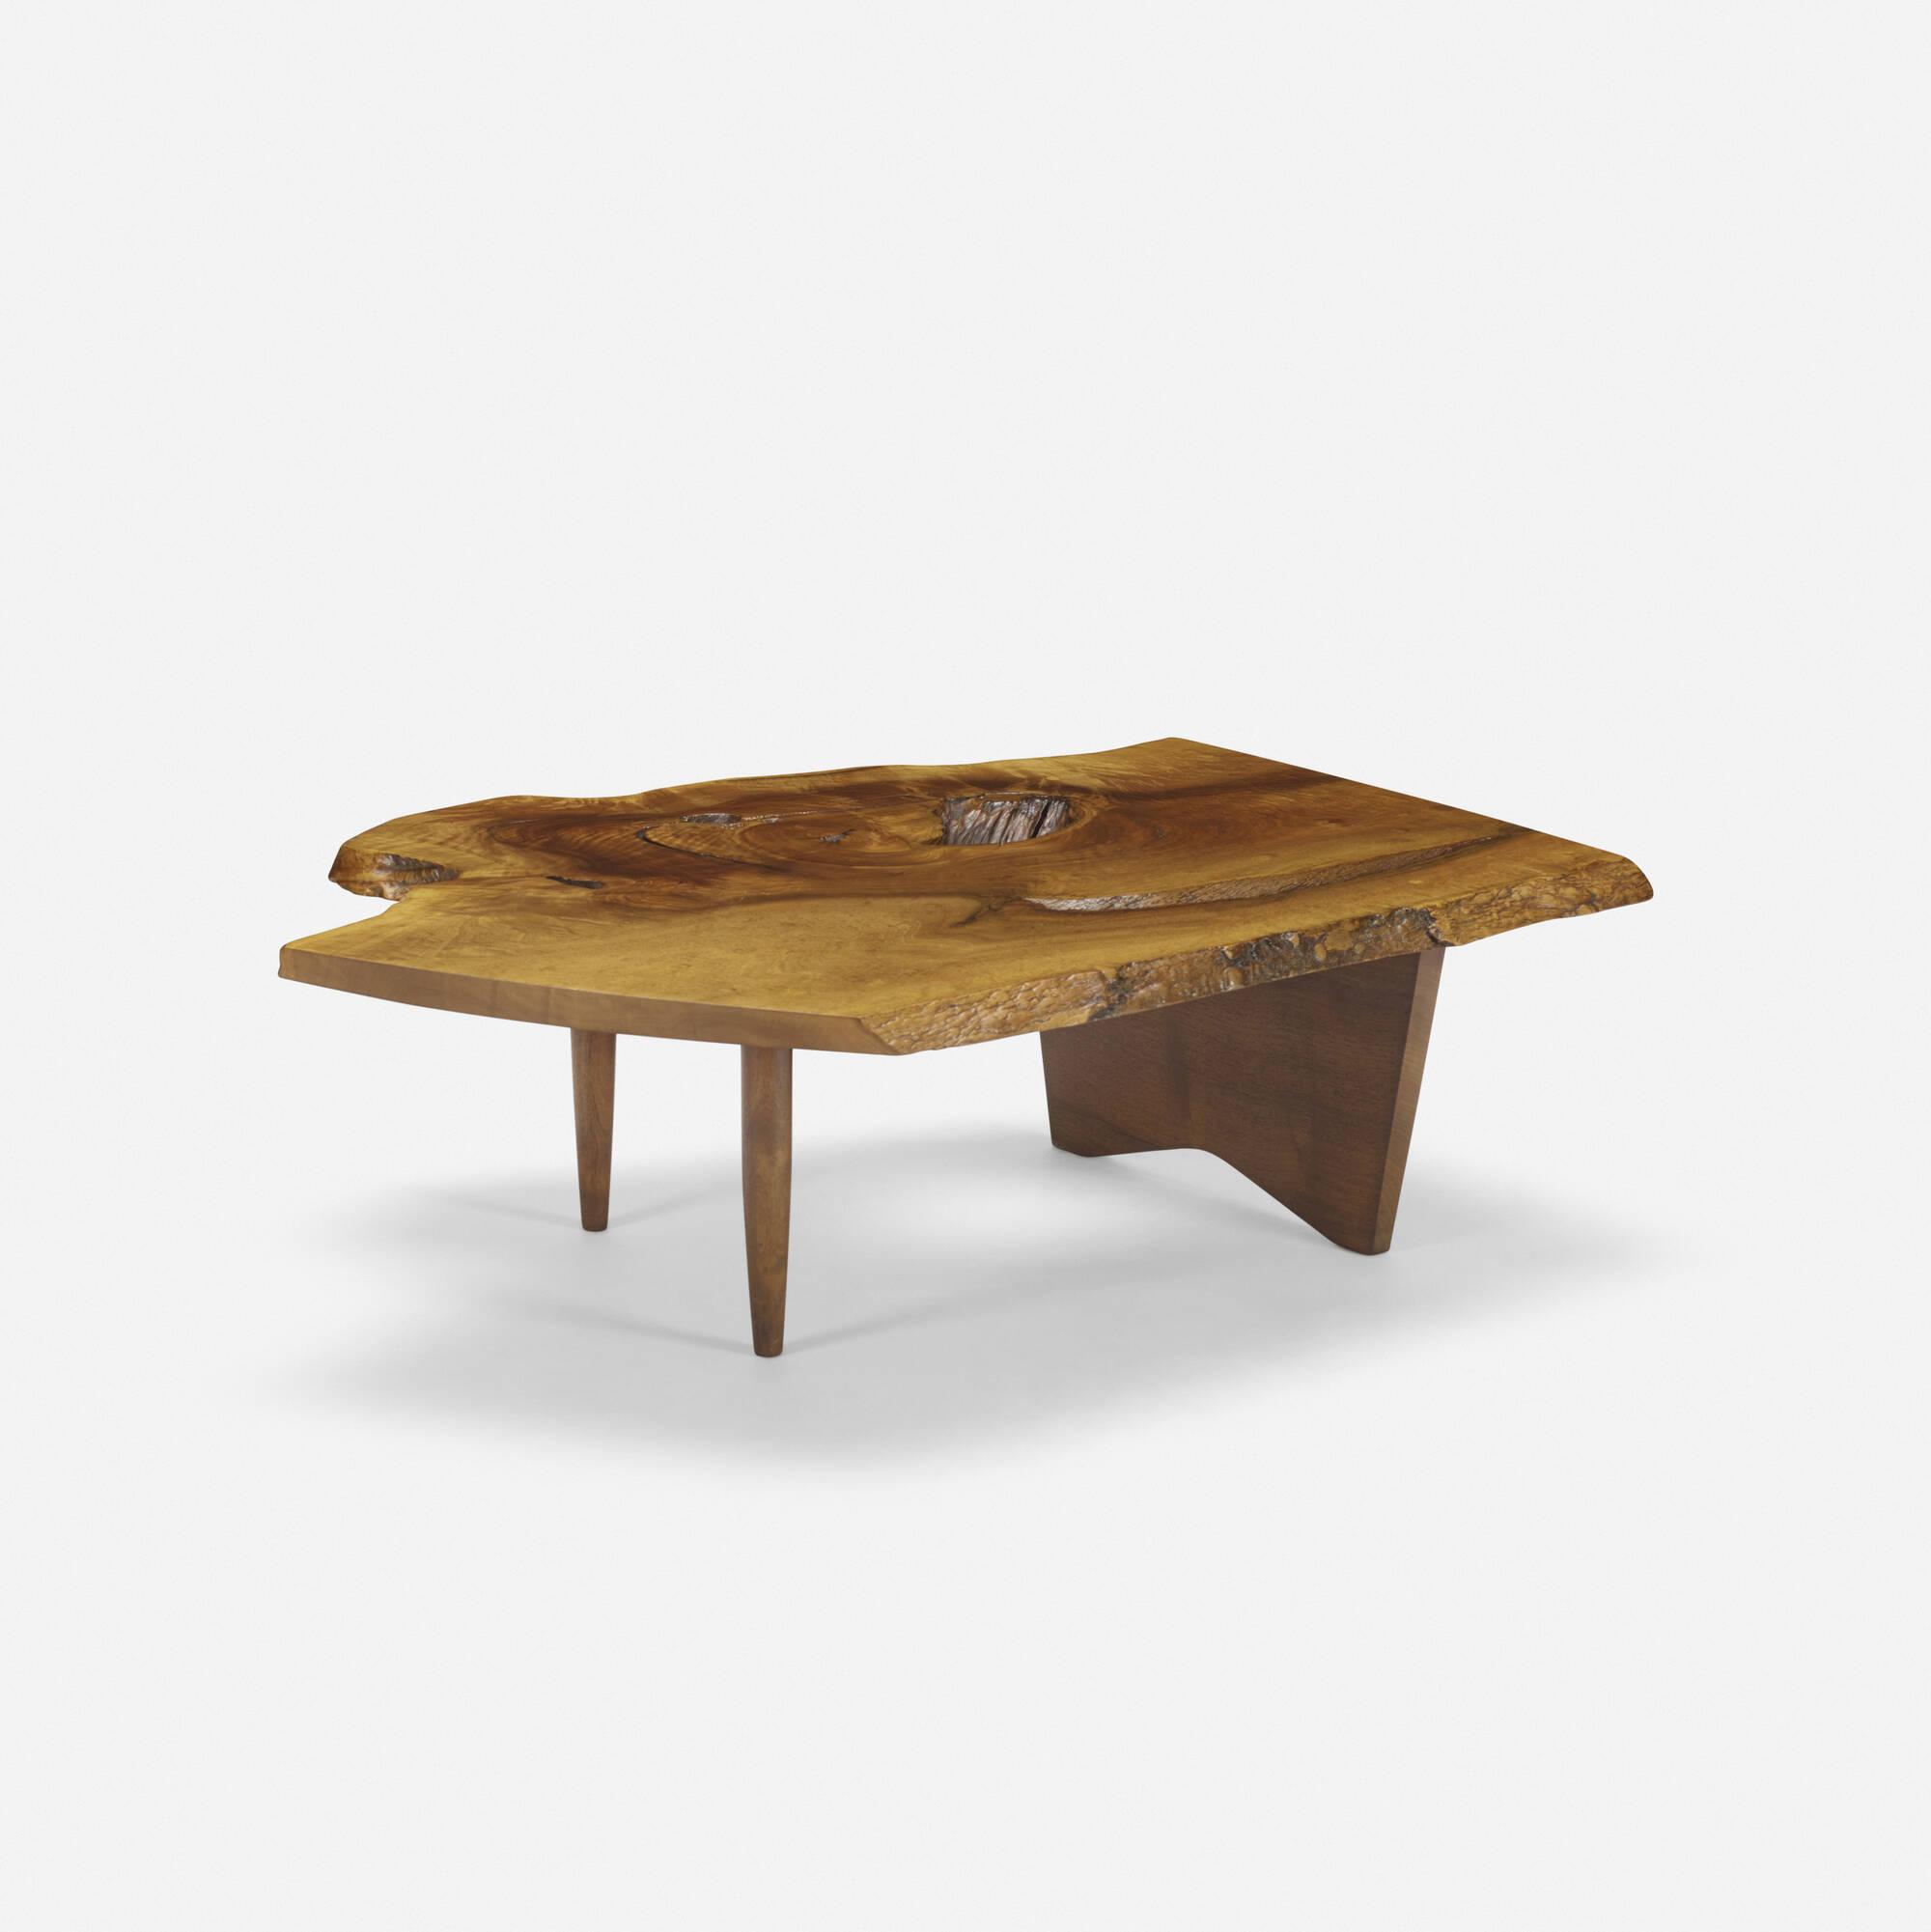 128: George Nakashima / Slab coffee table (2 of 2)